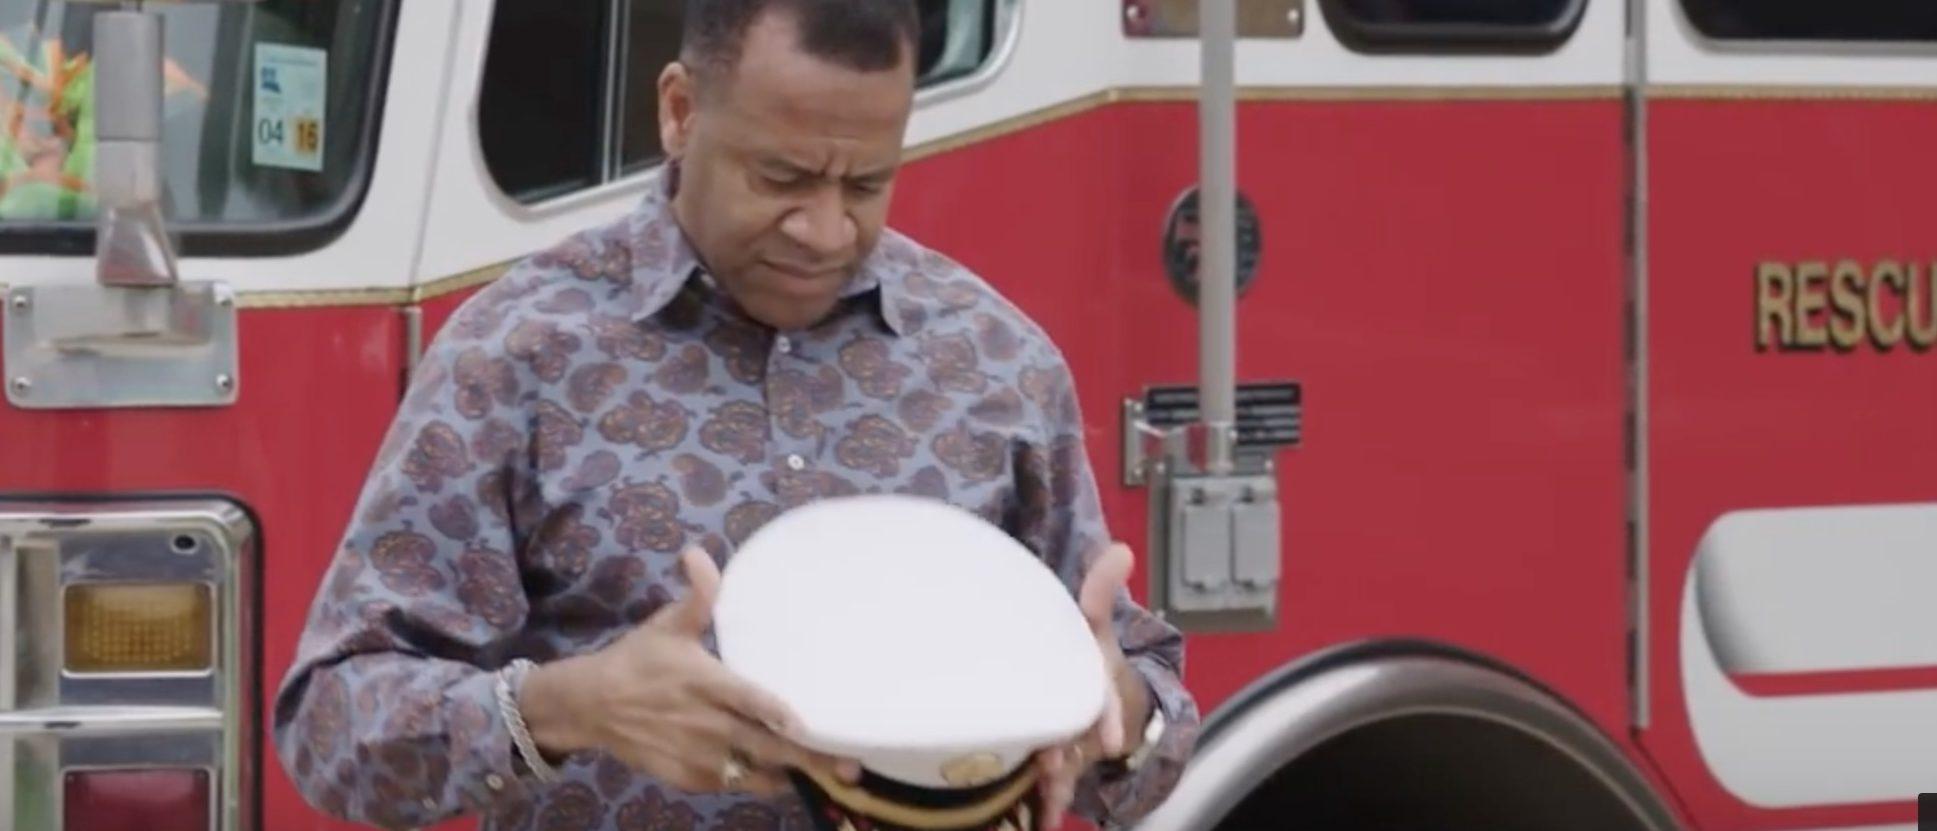 Former Atlanta fire chief Kelvin Cochran shares his story./Screenshot/YouTube